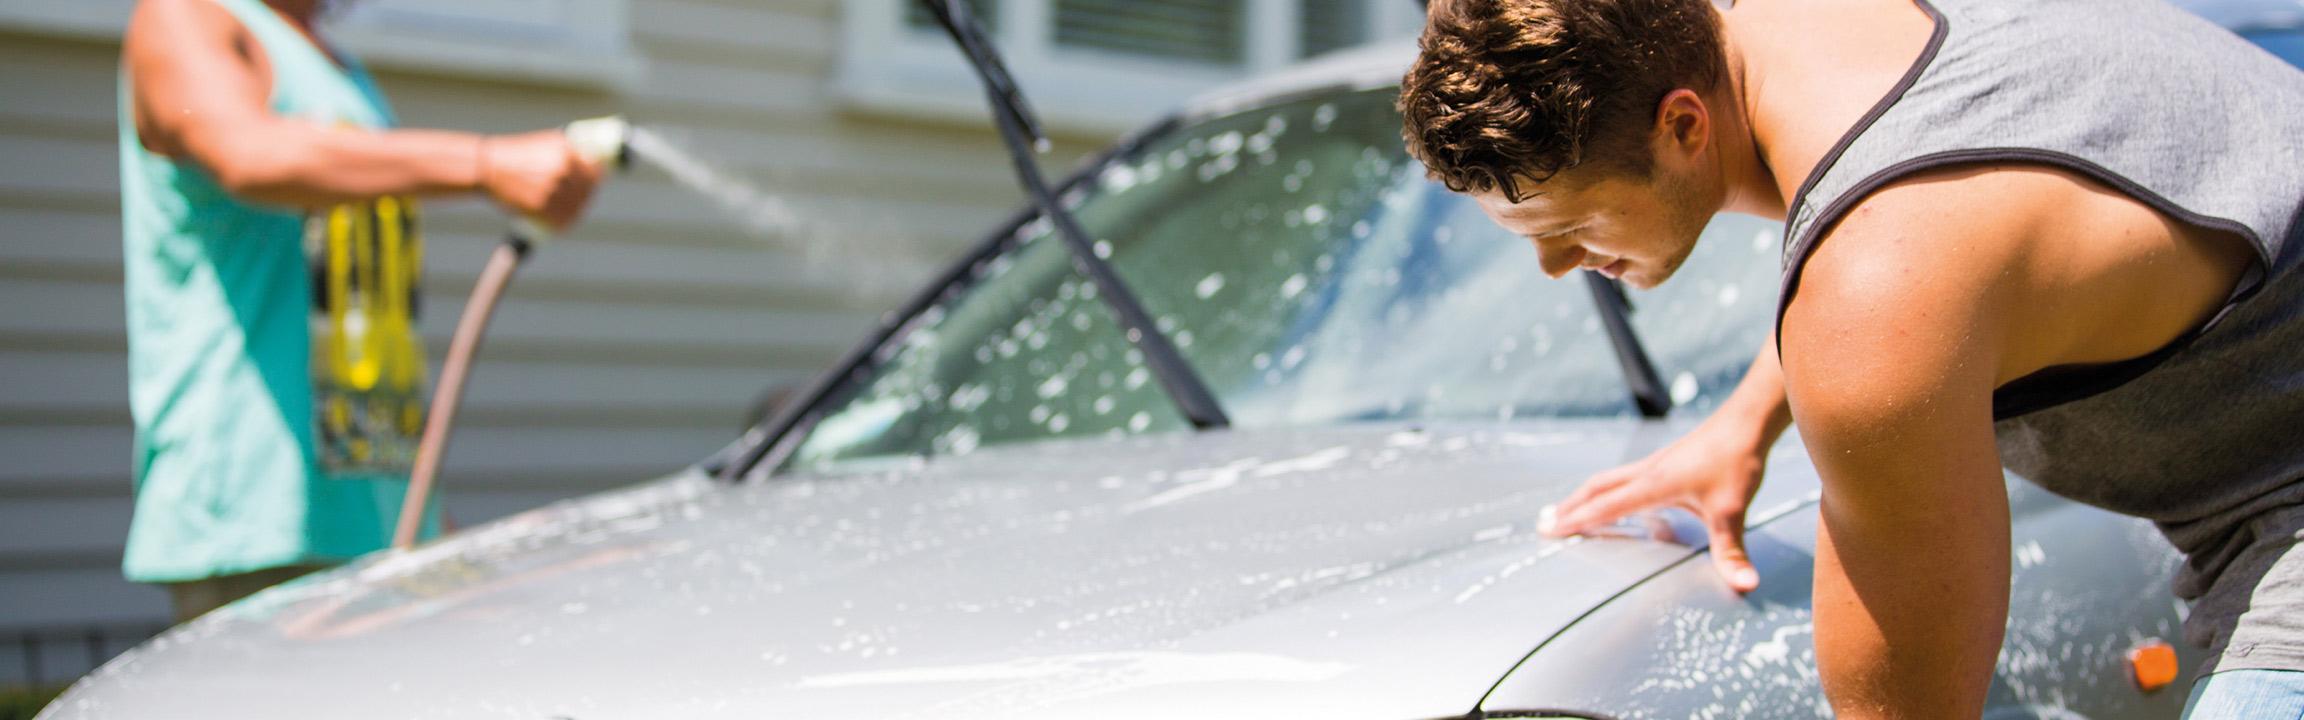 Two men washing a car